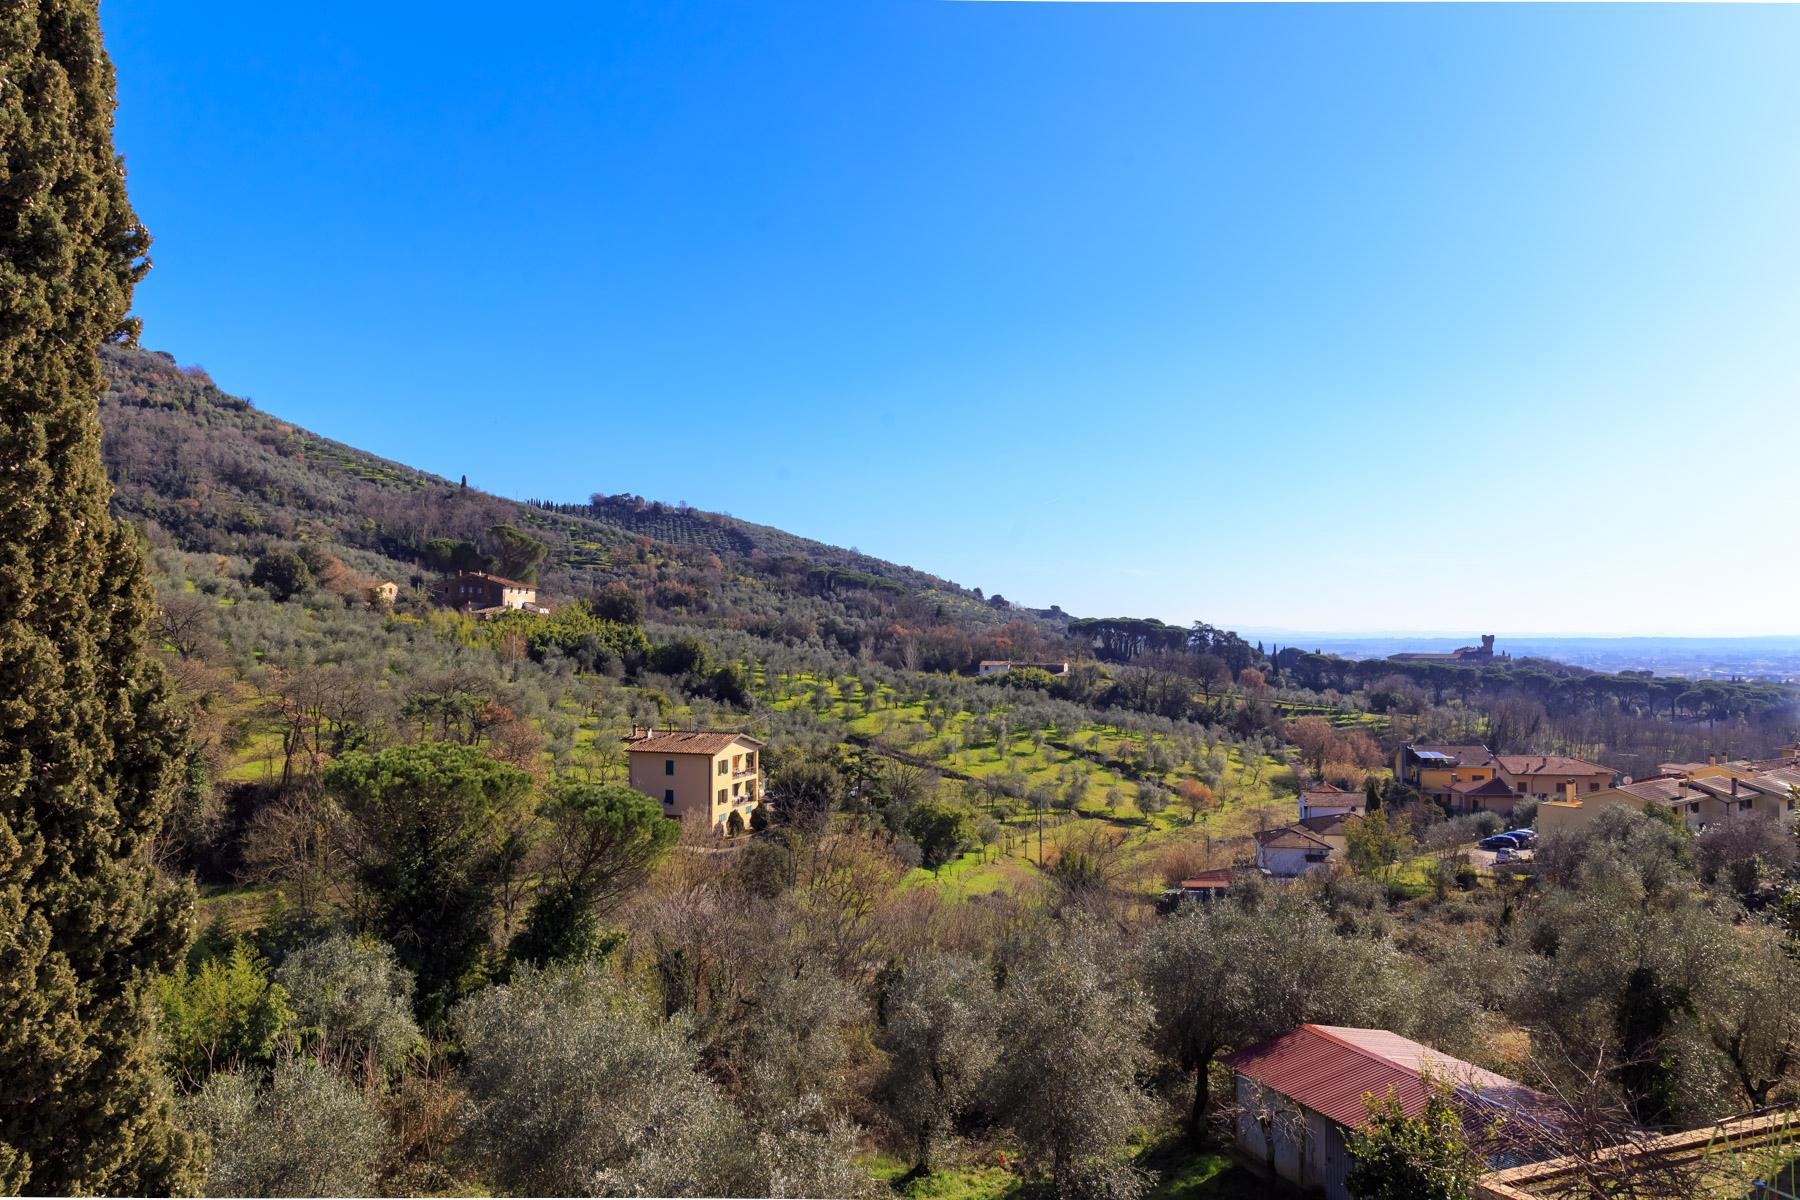 Montecatini Terme小镇优雅的新艺术风格的别墅 - 15